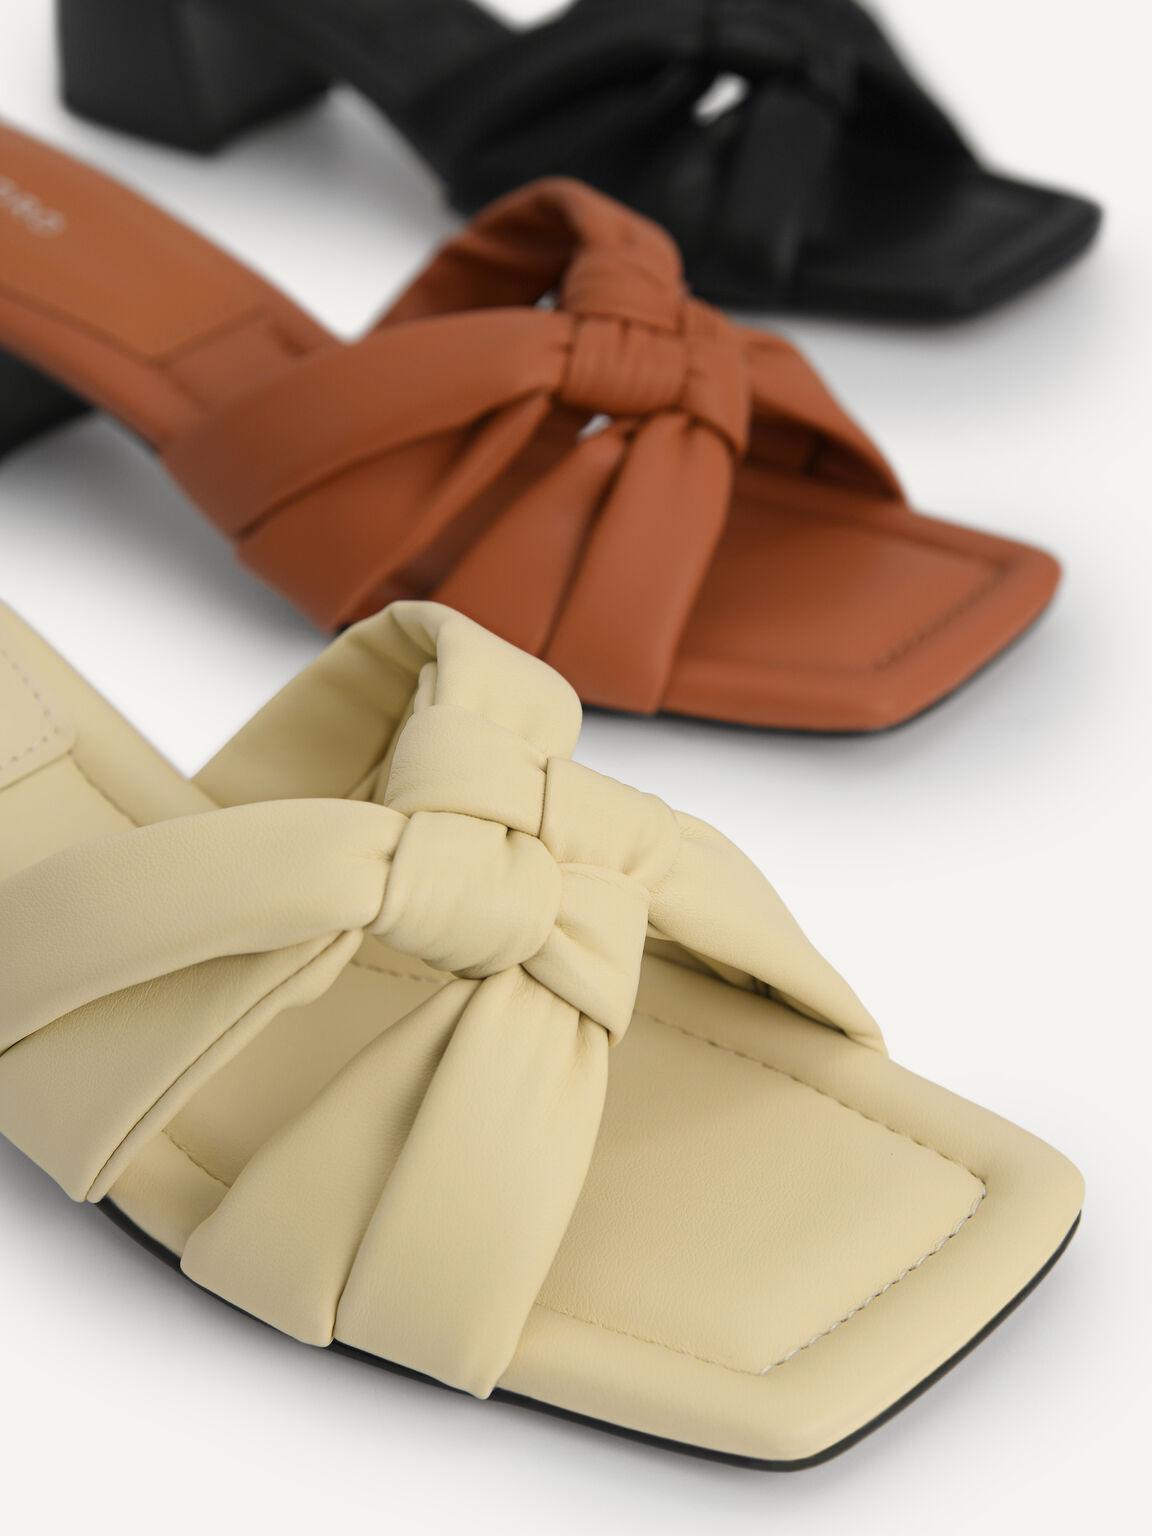 Knotted Straps Heeled Sandals, Cognac, hi-res